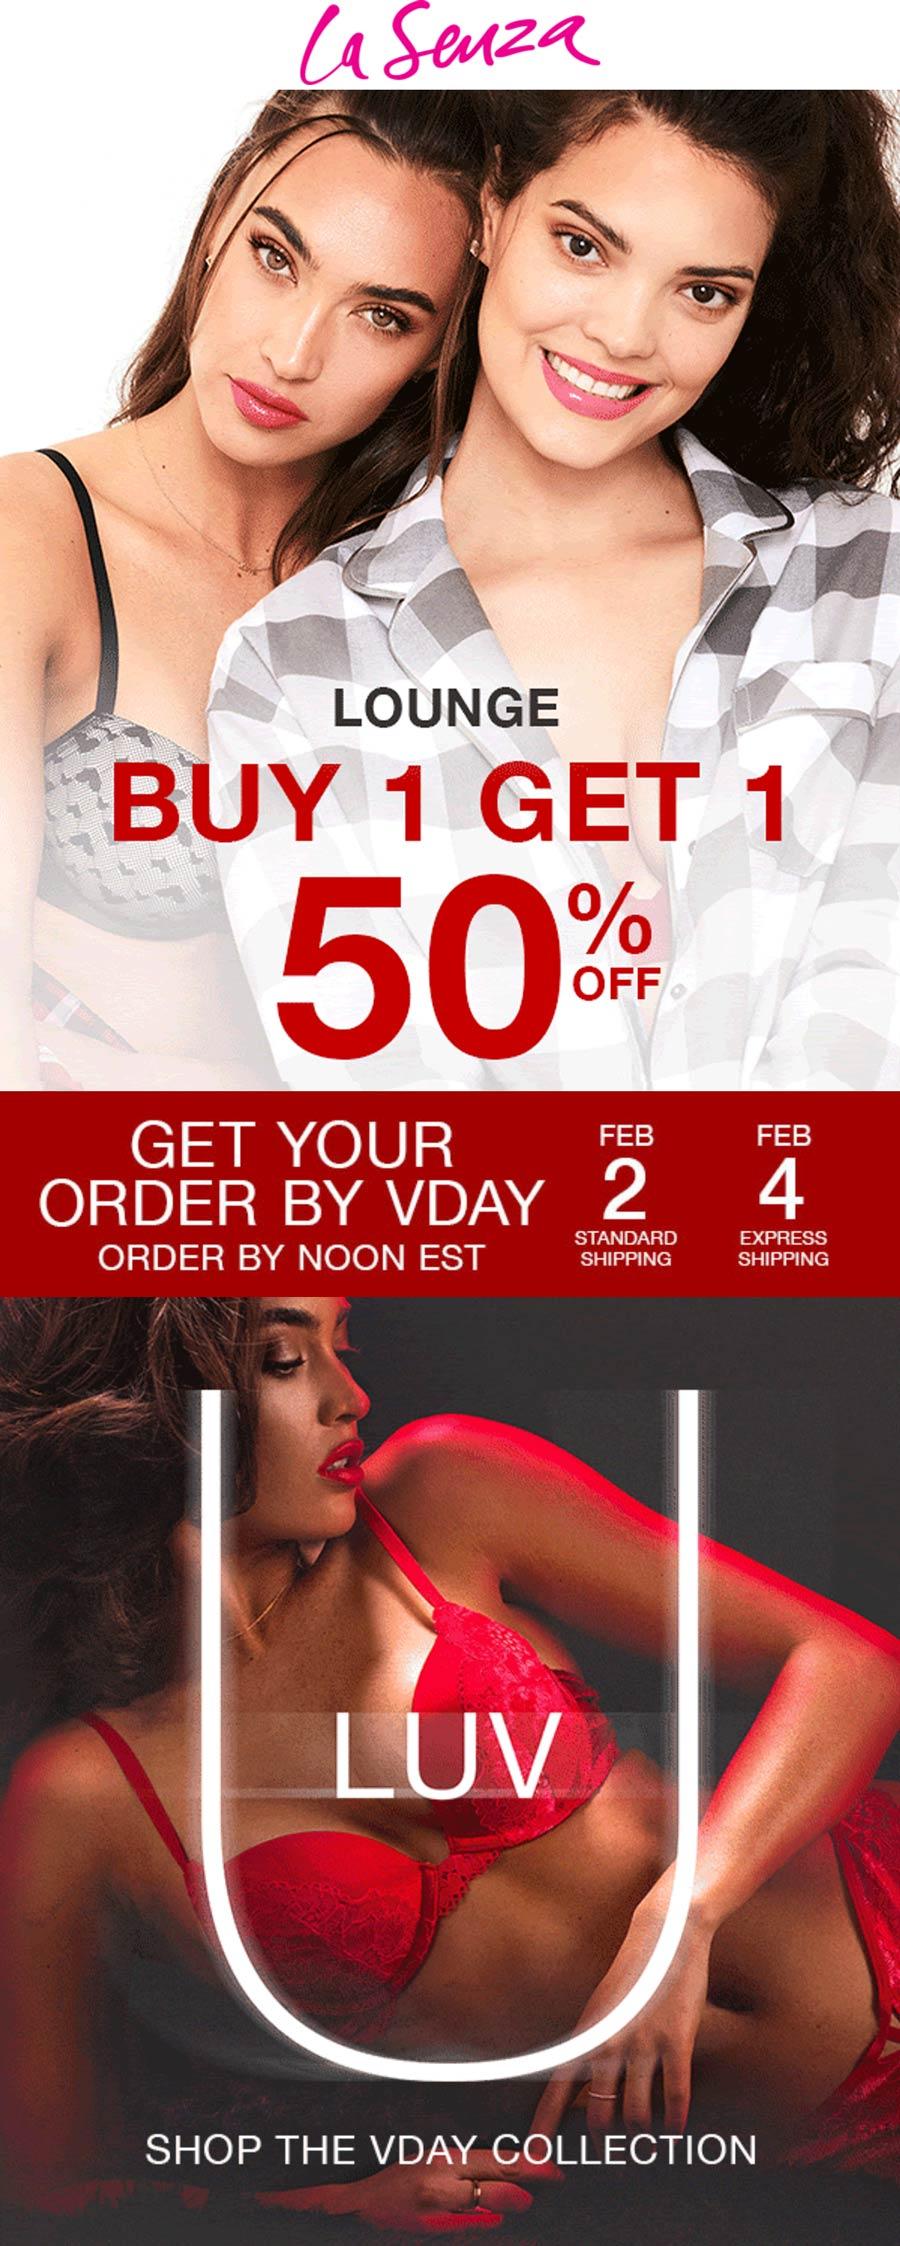 La Senza stores Coupon  Second Valentines loungewear 50% off at La Senza #lasenza